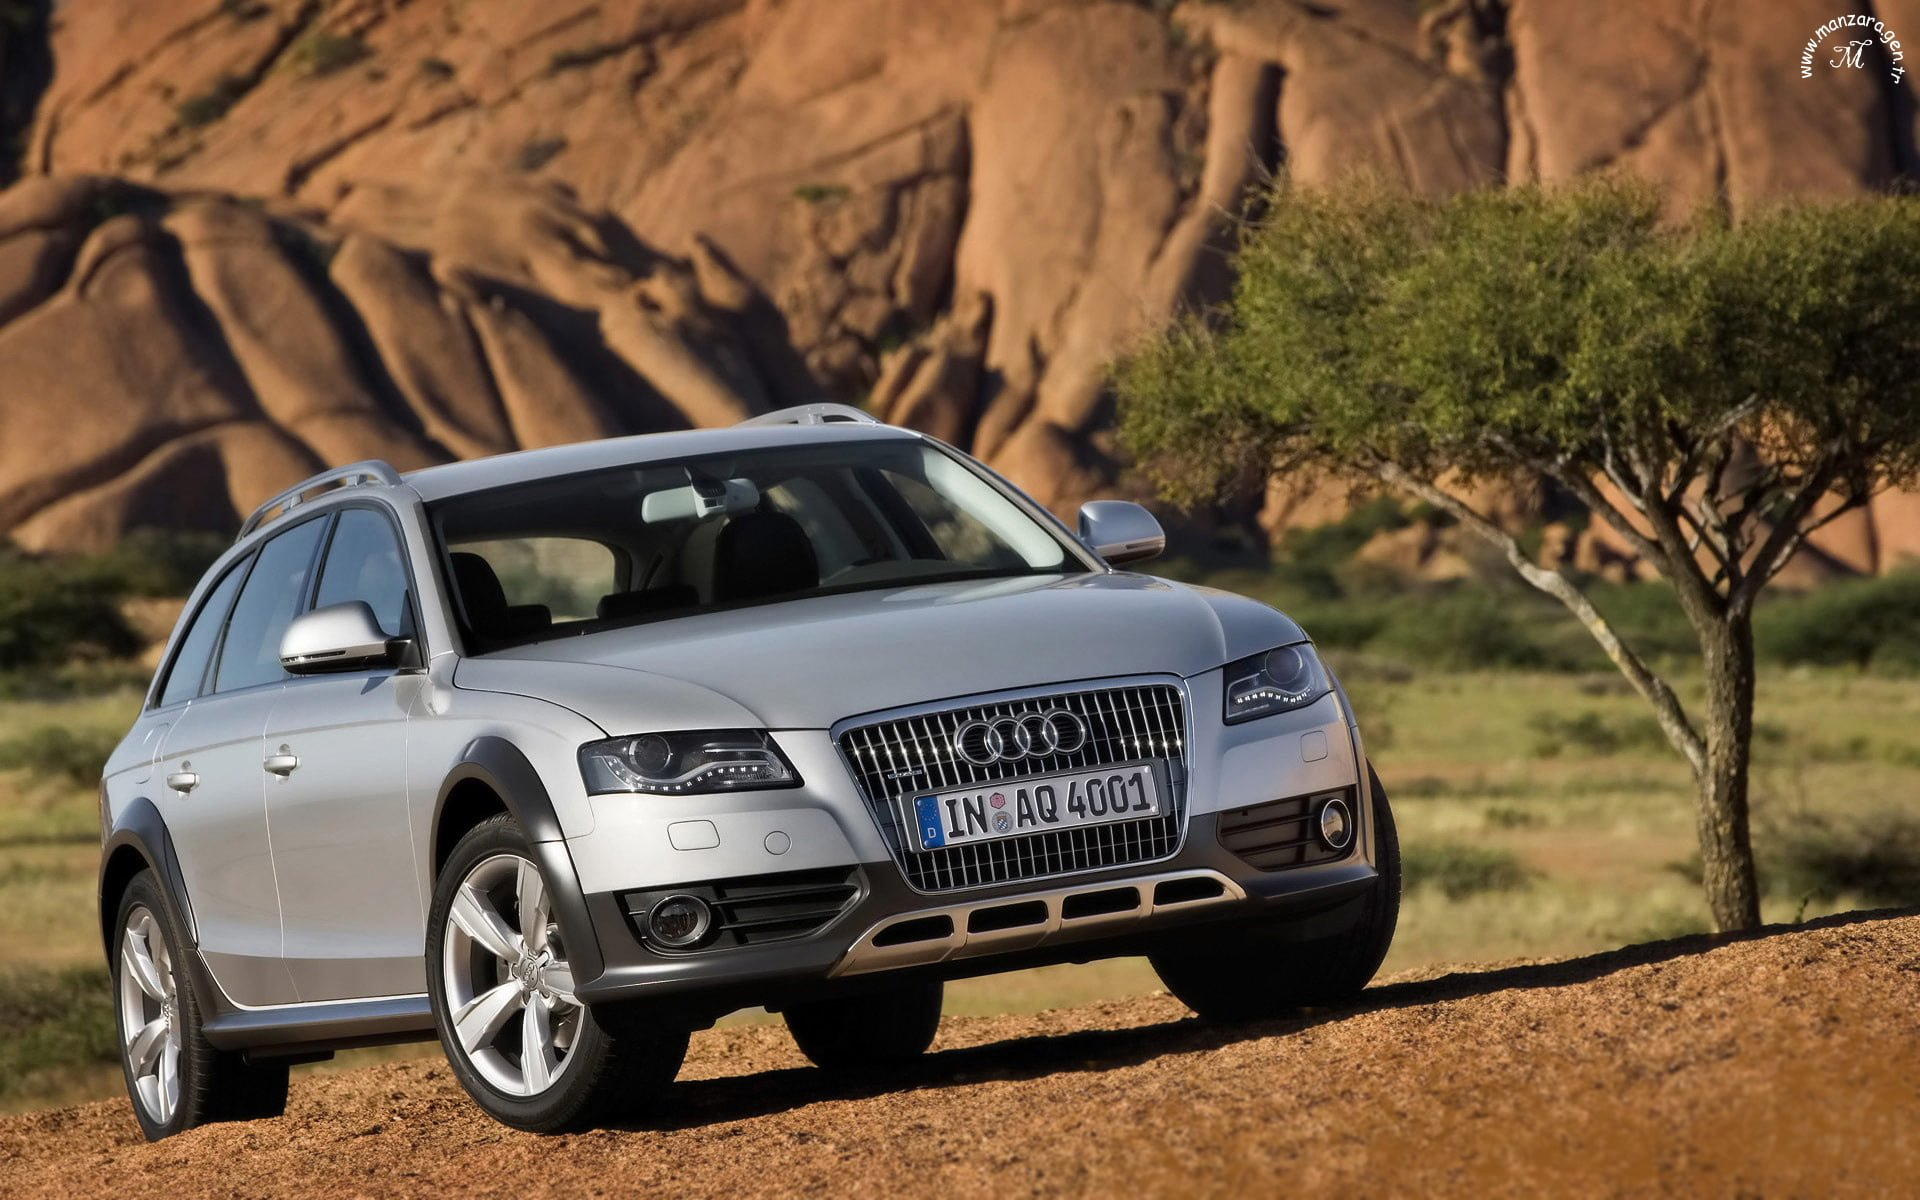 Audi A4 – 5